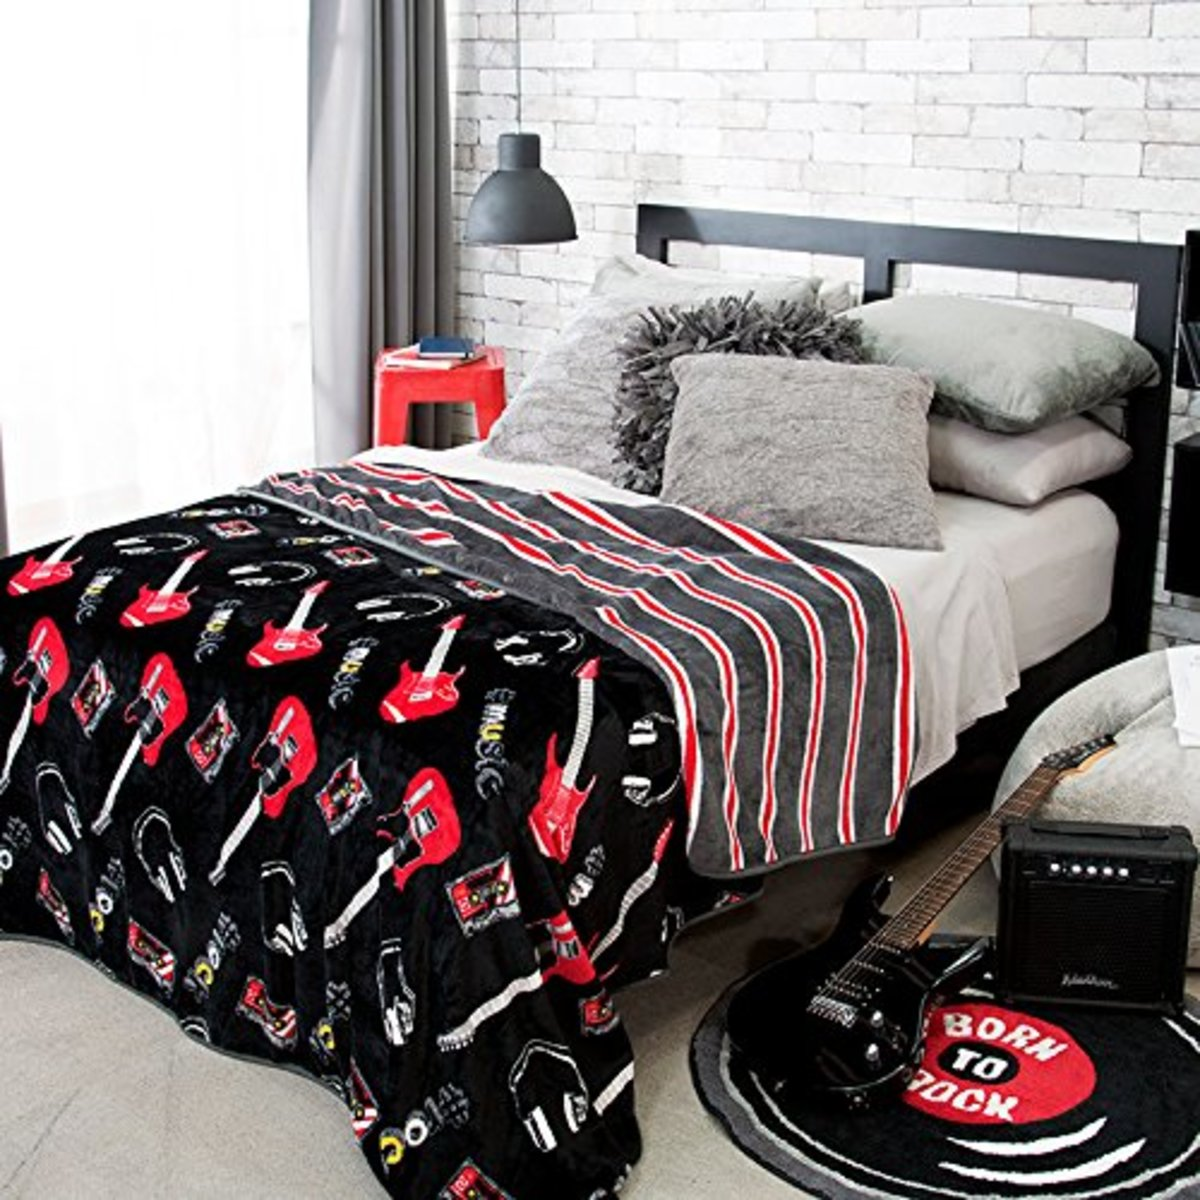 rock-n-roll-guitar-bedroom-decor-ideas